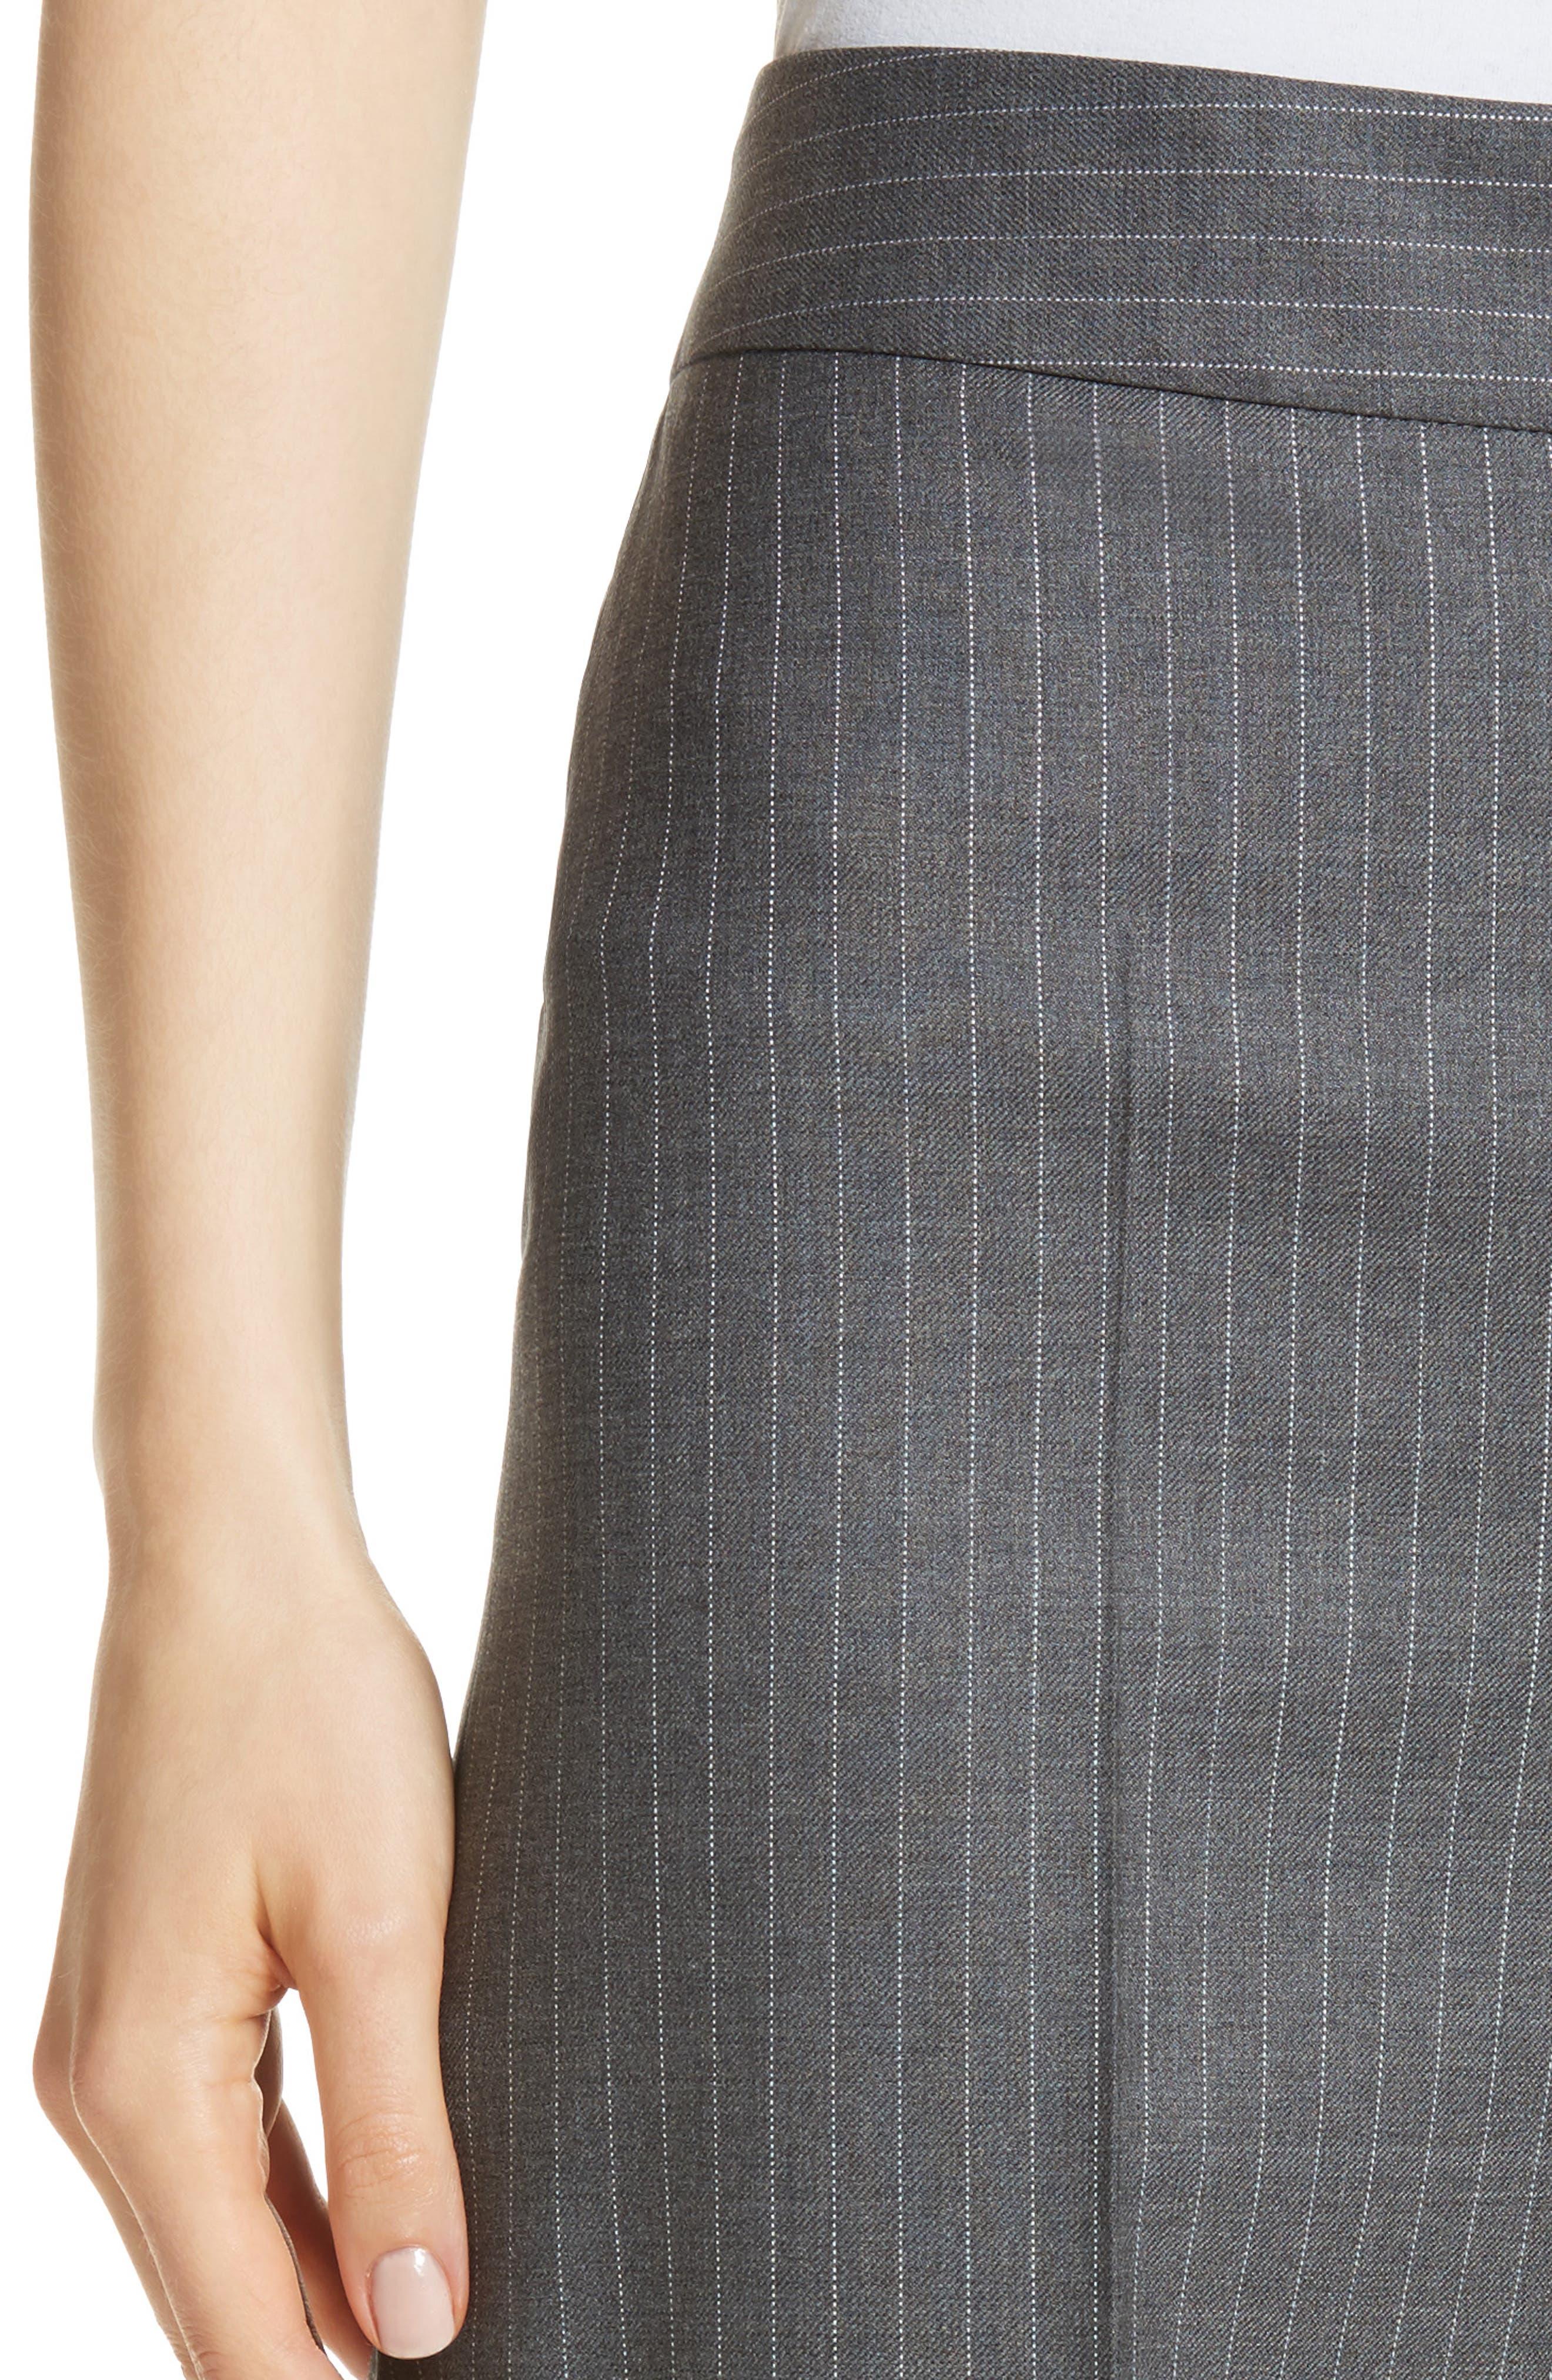 Garibo Stretch Wool Pinstripe Pants,                             Alternate thumbnail 4, color,                             034